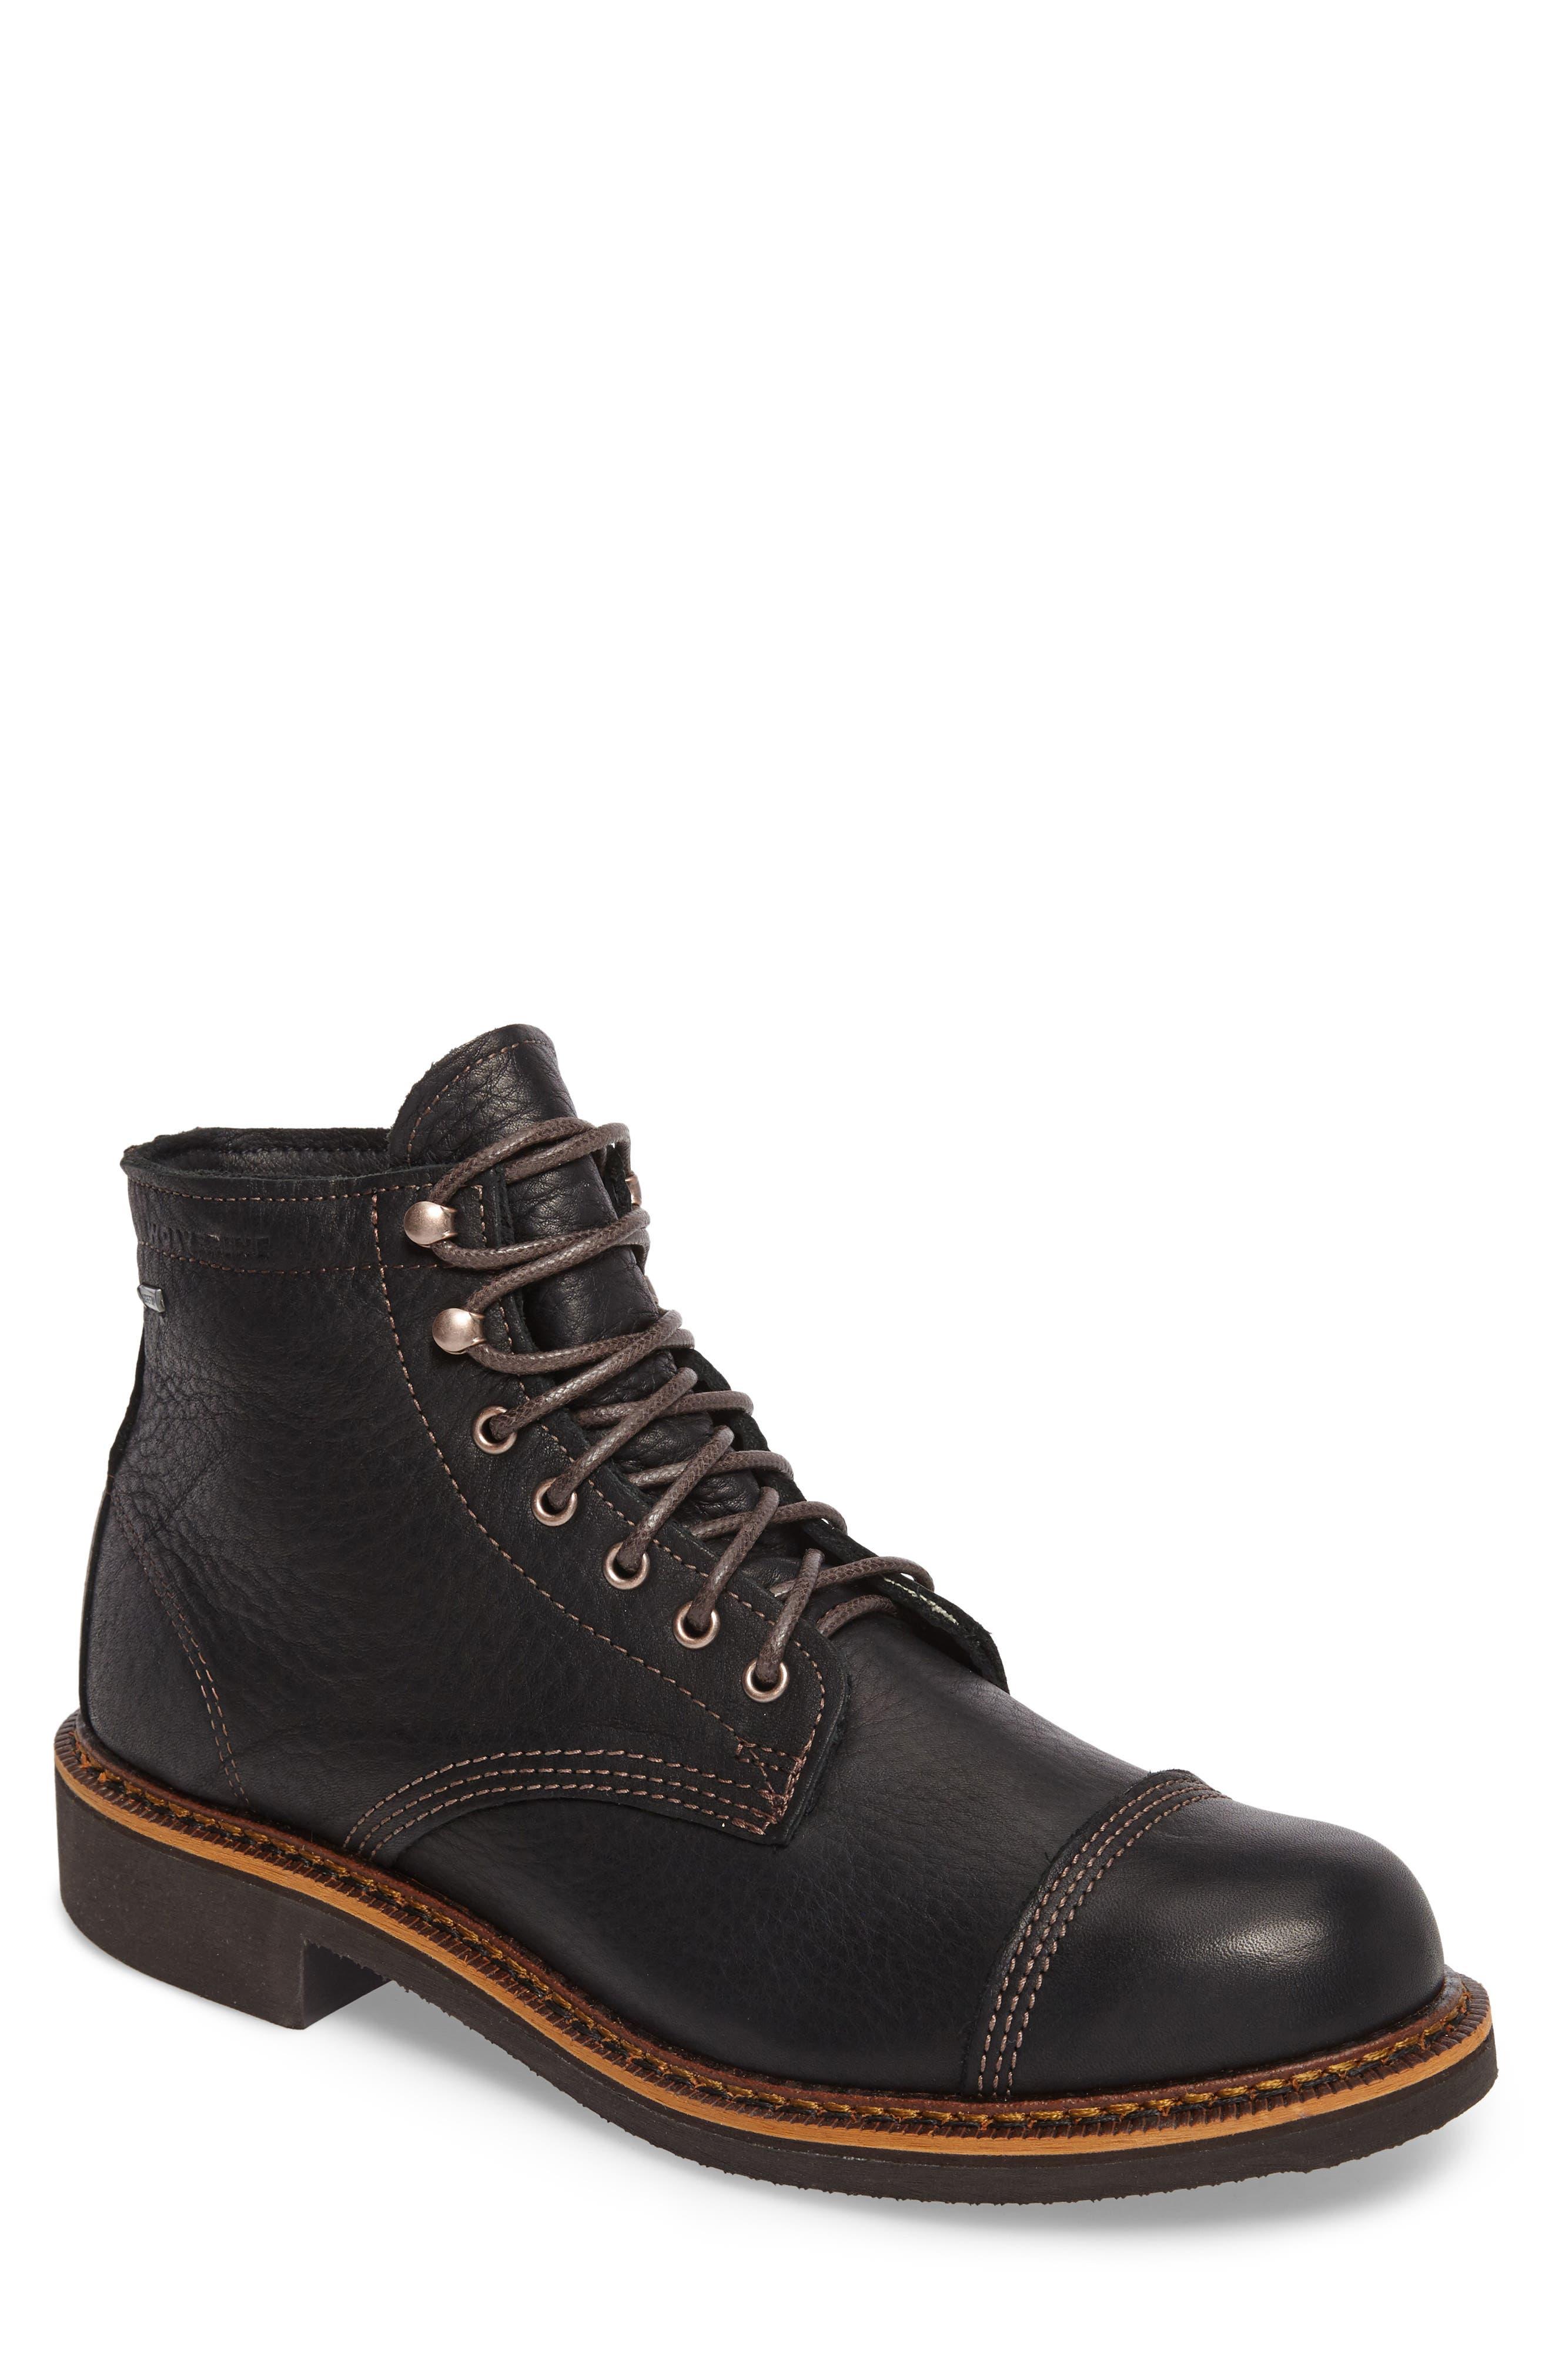 Jensen Cap Toe Boot,                         Main,                         color, BLACK